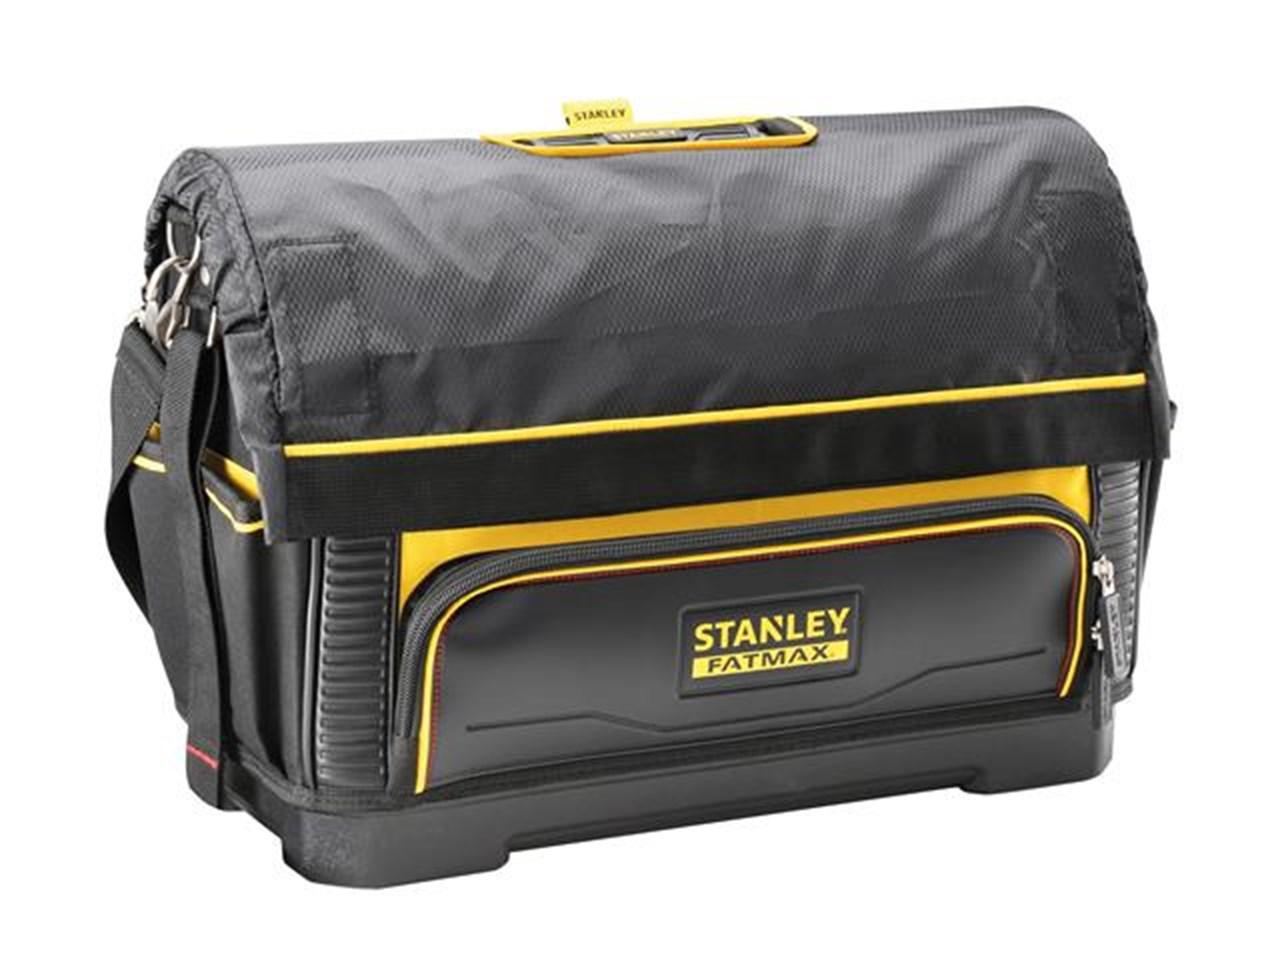 Stanley Fatmax Open Tote Tool Bag